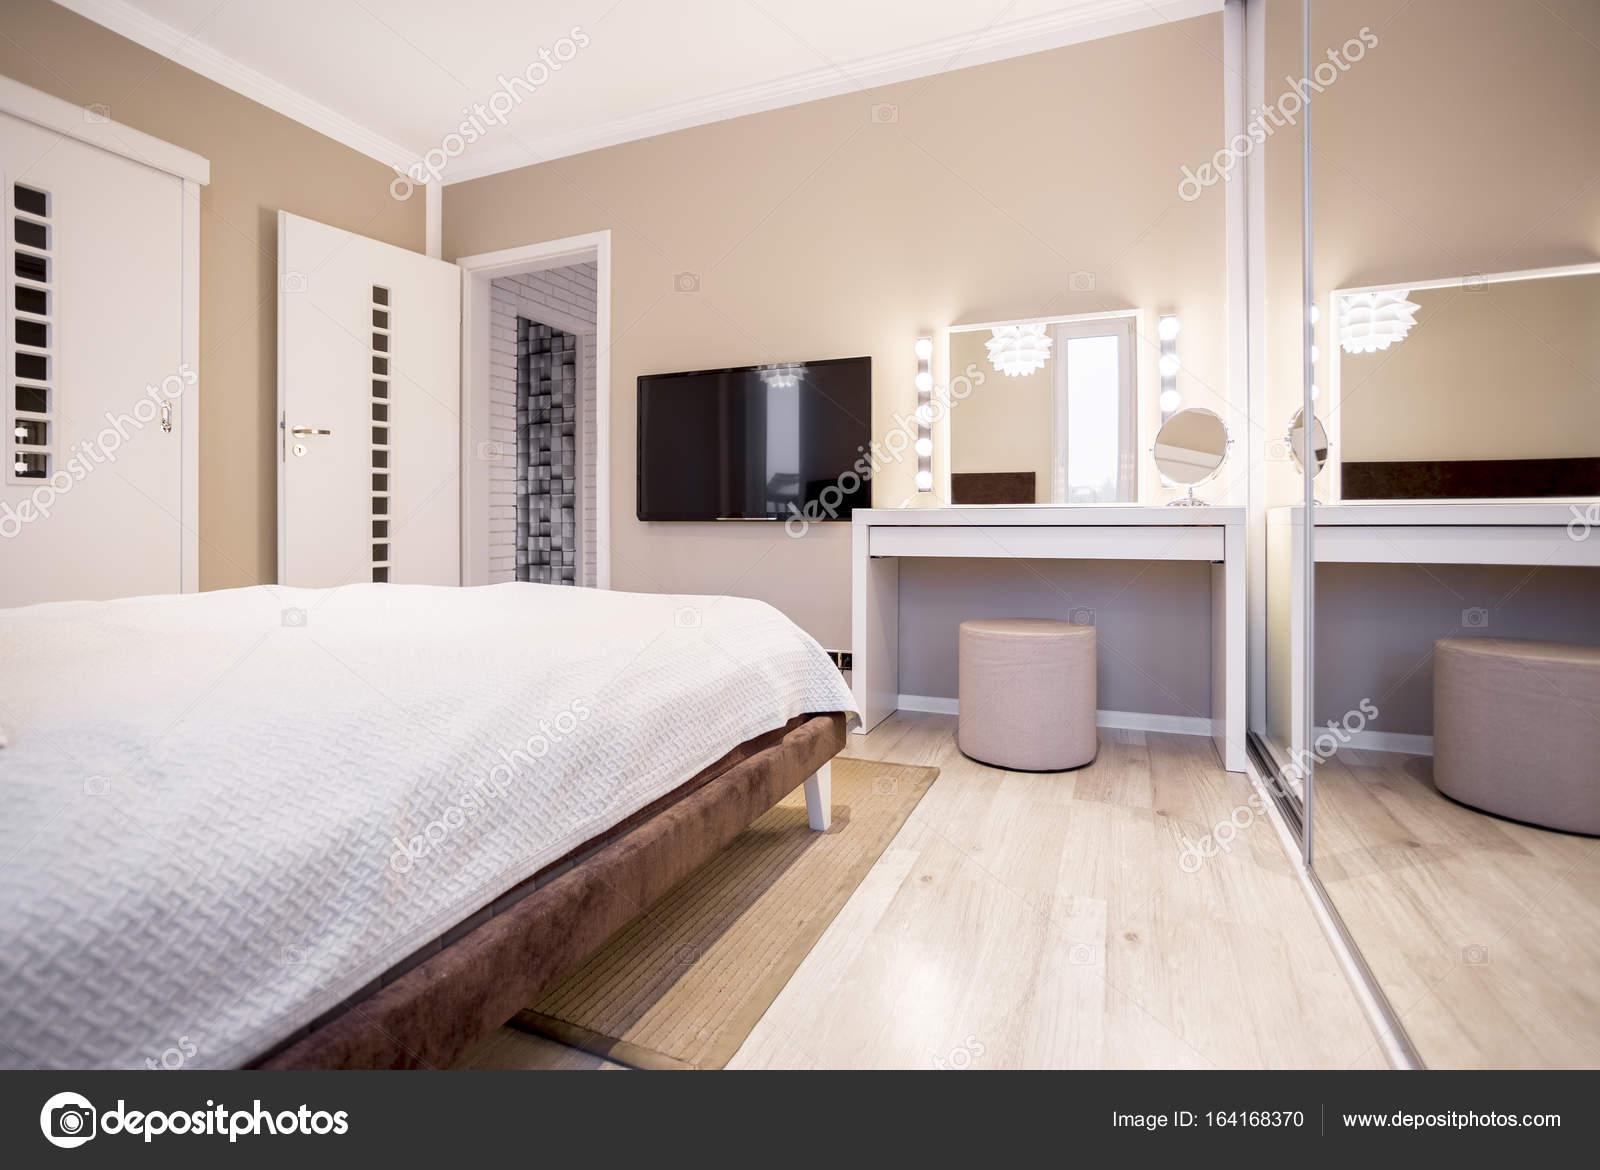 https://st3.depositphotos.com/2249091/16416/i/1600/depositphotos_164168370-stockafbeelding-slaapkamer-met-tv-en-kaptafel.jpg